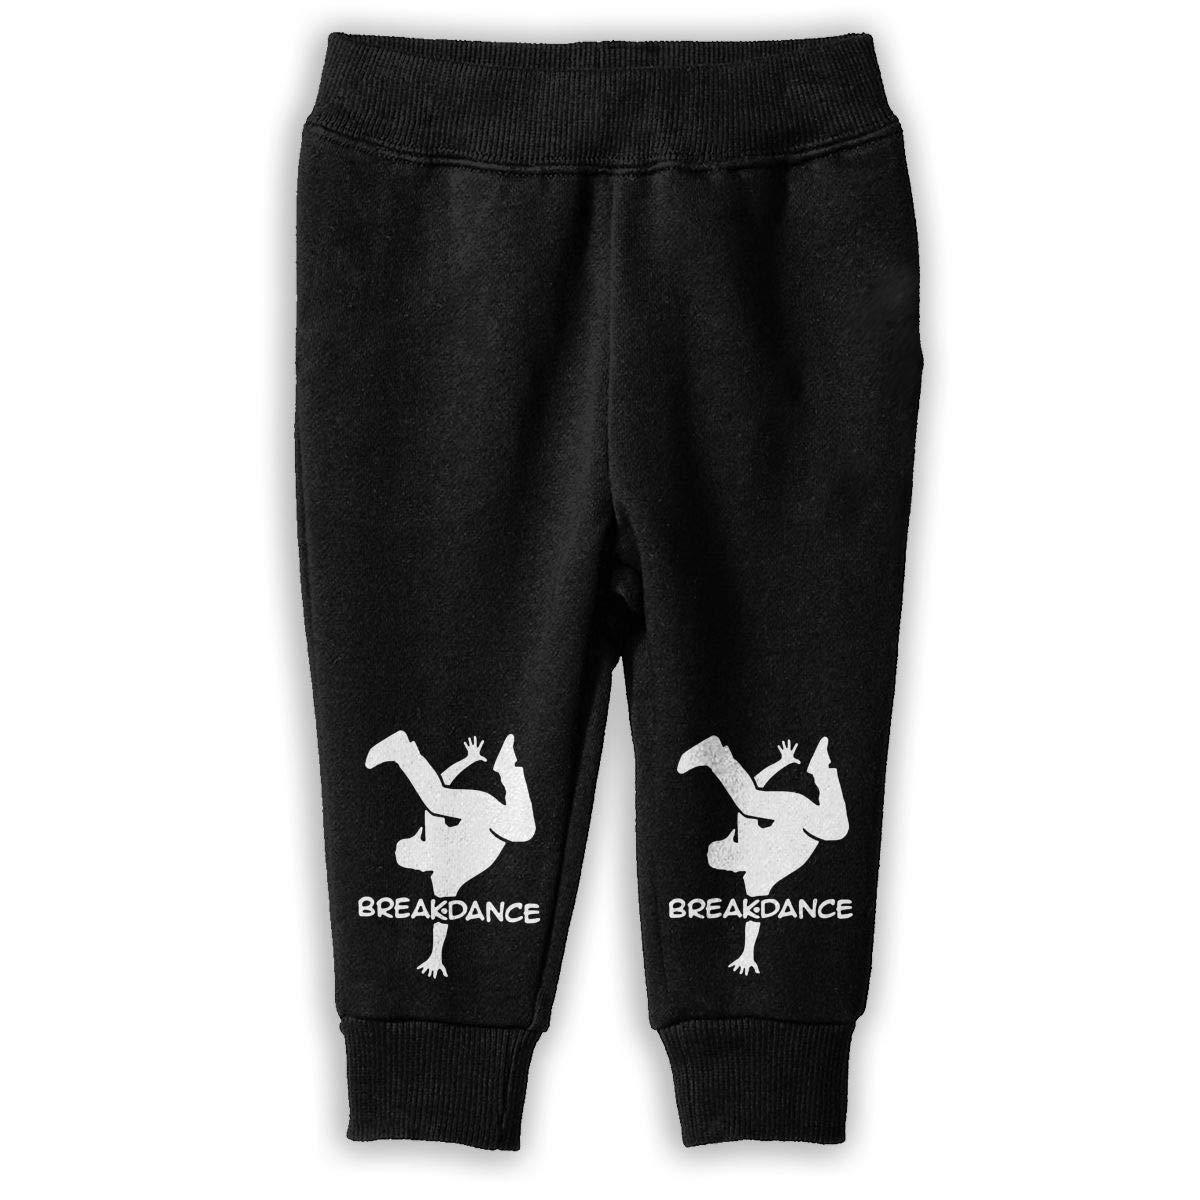 Printed Breakdancing Silhouette Child Boys /& Girls Unisex Sports Sweatpants